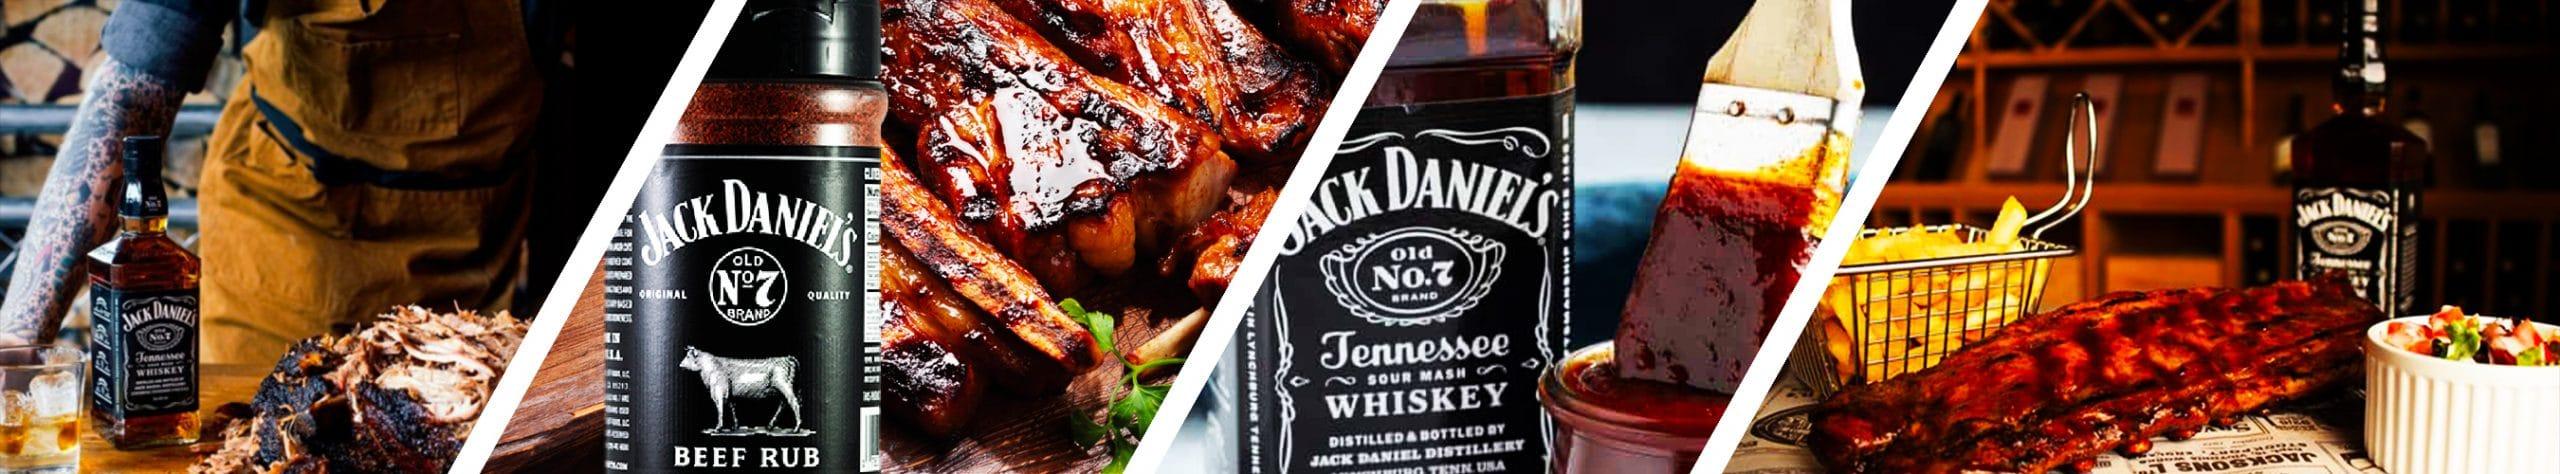 Jack Daniel's Barbecue